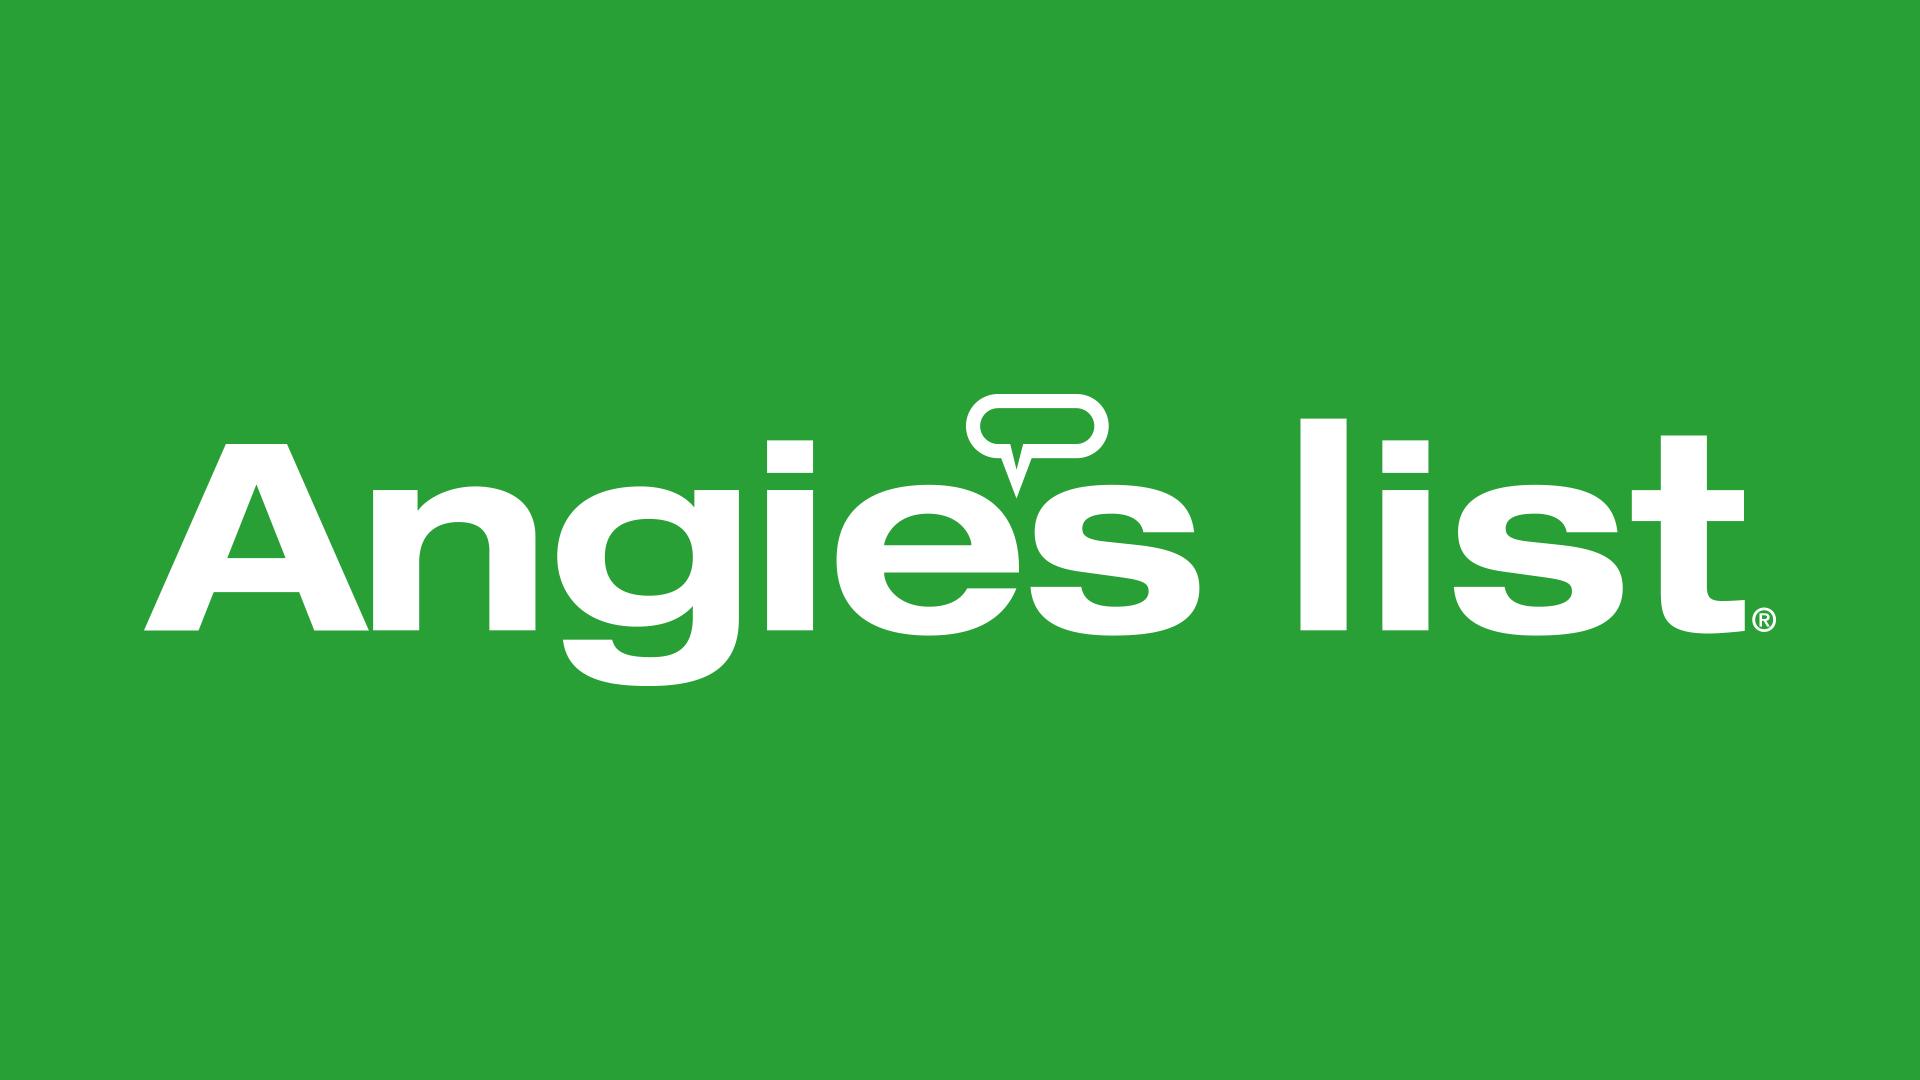 angies-lista-1920